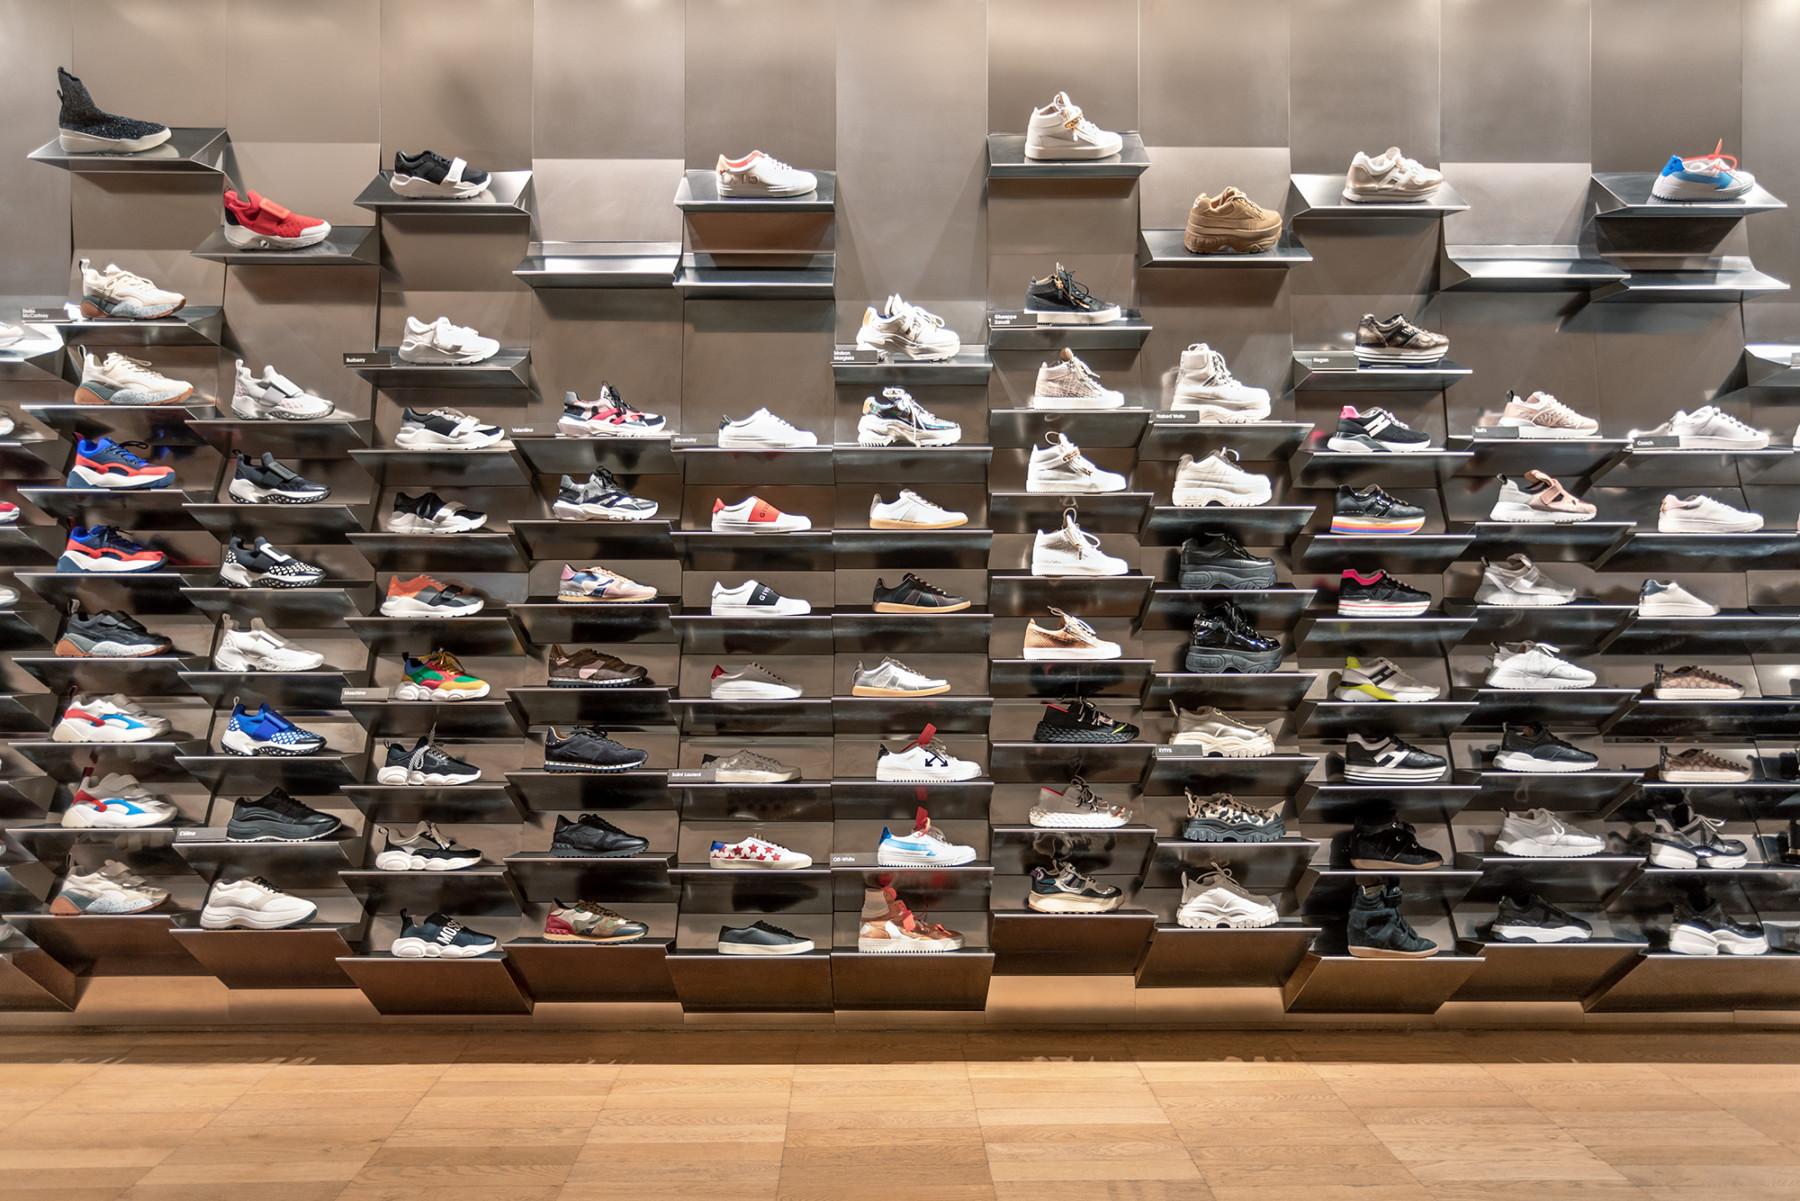 jamie-fobert-architects-selfridges-shoe-galleries-luxury-retail-concept-gallery-design-olivier-hess-photos-sneaker-wall2